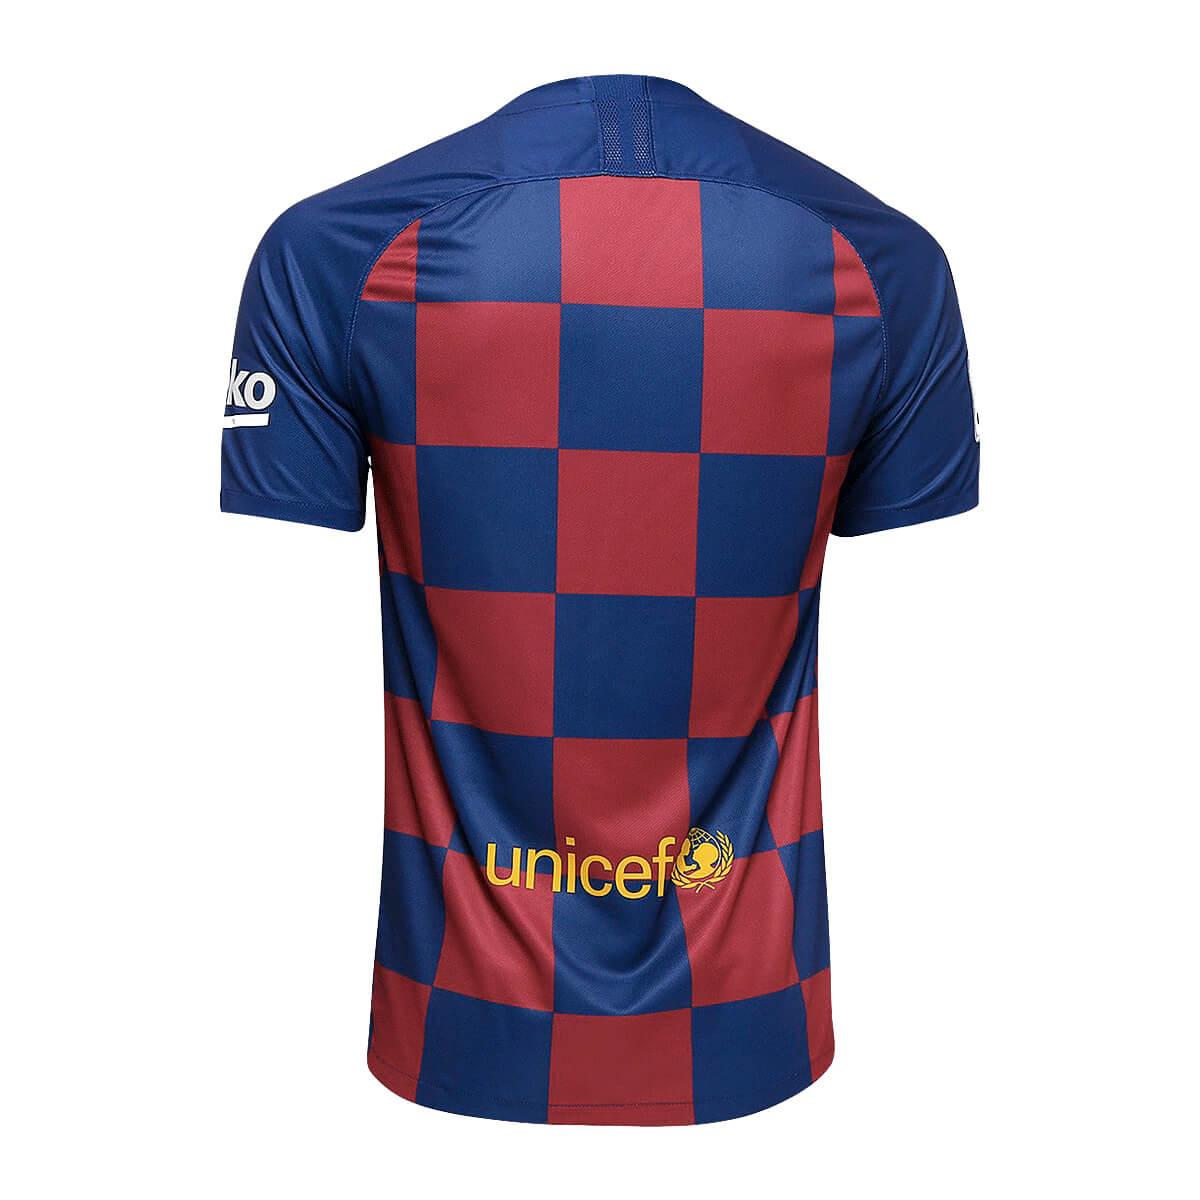 Camisa Barcelona Nike Home Torcedor SN 19 20